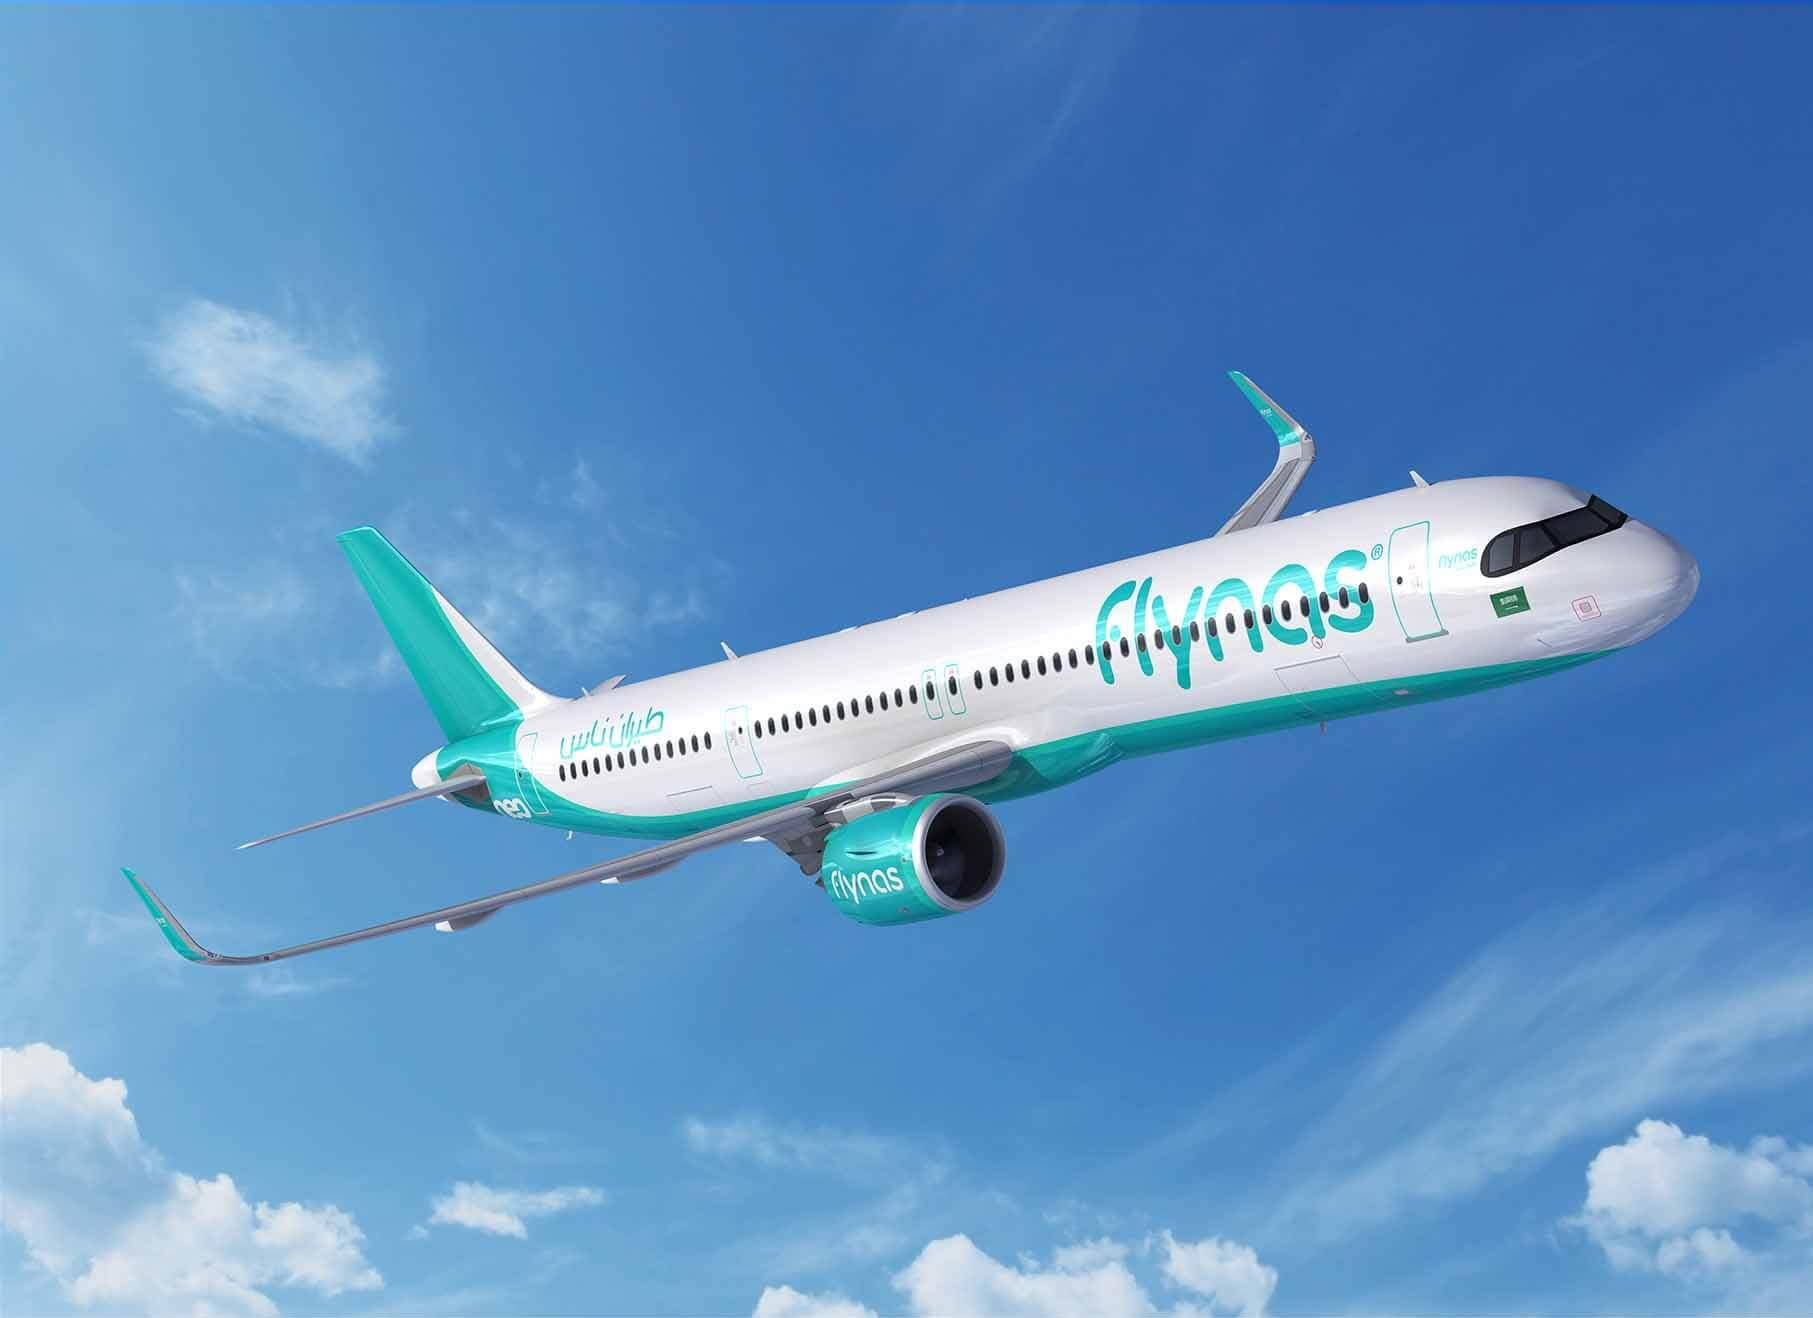 Saudi Arabia's flynas orders 10 A321XLR jets at 2019 Dubai Airshow